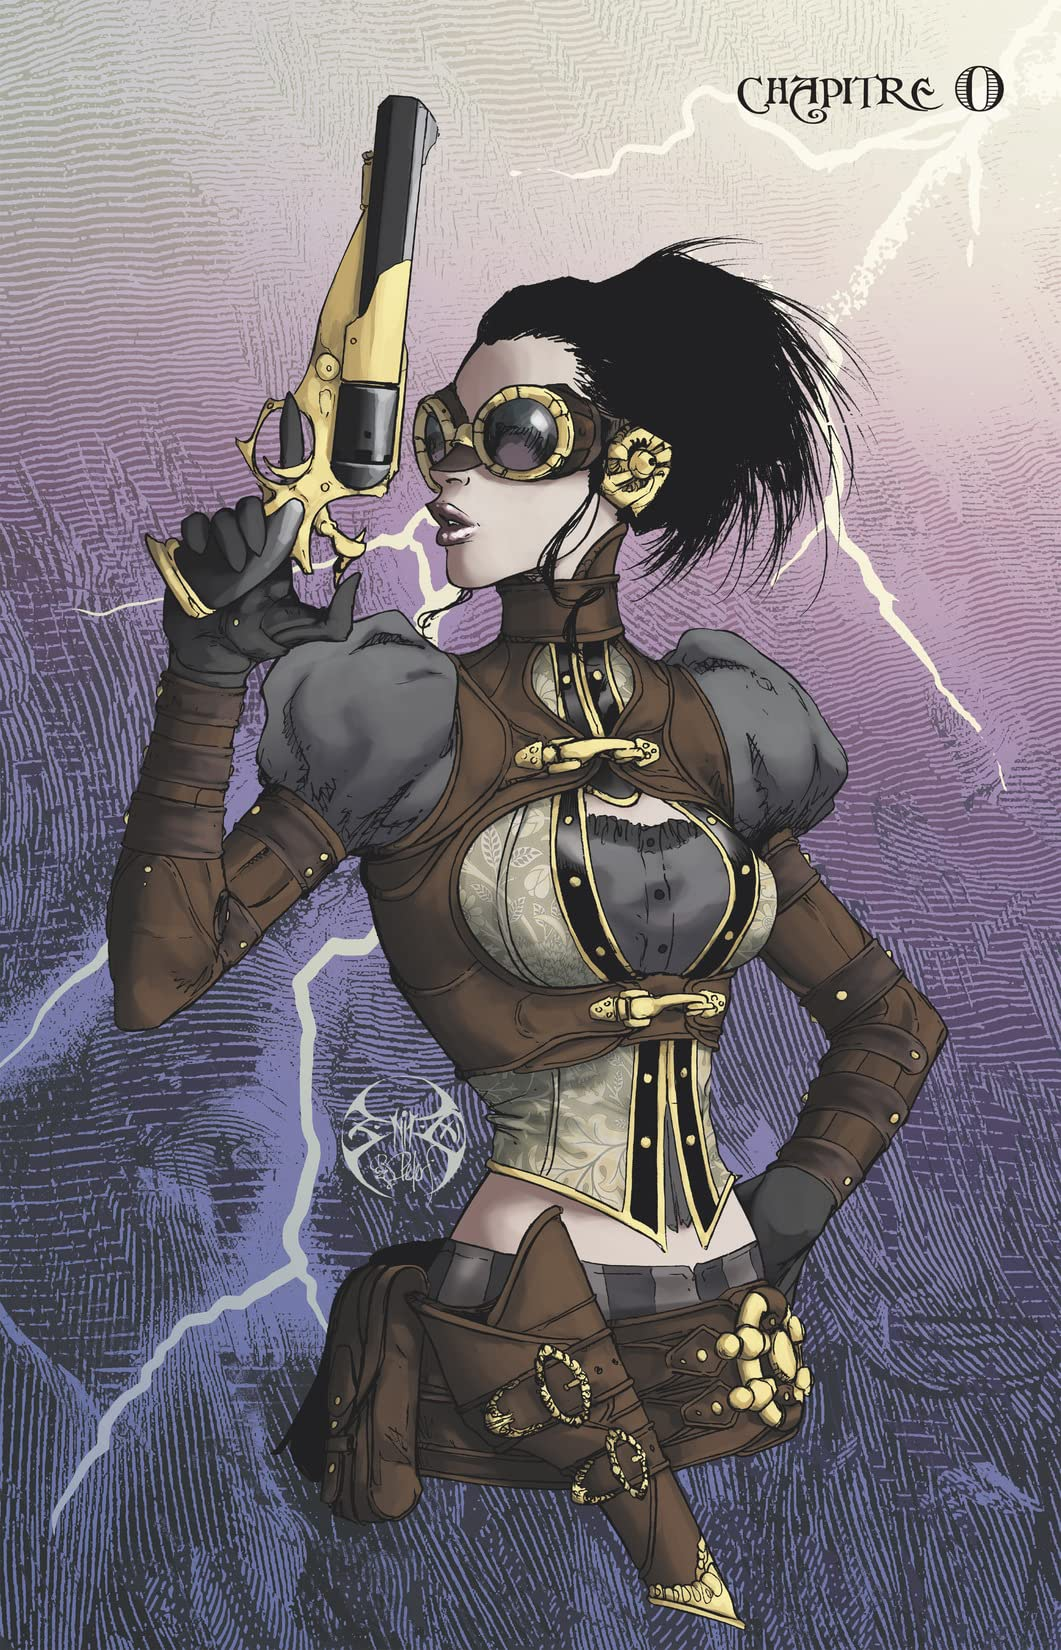 Lady Mechanika: Chapitre 0